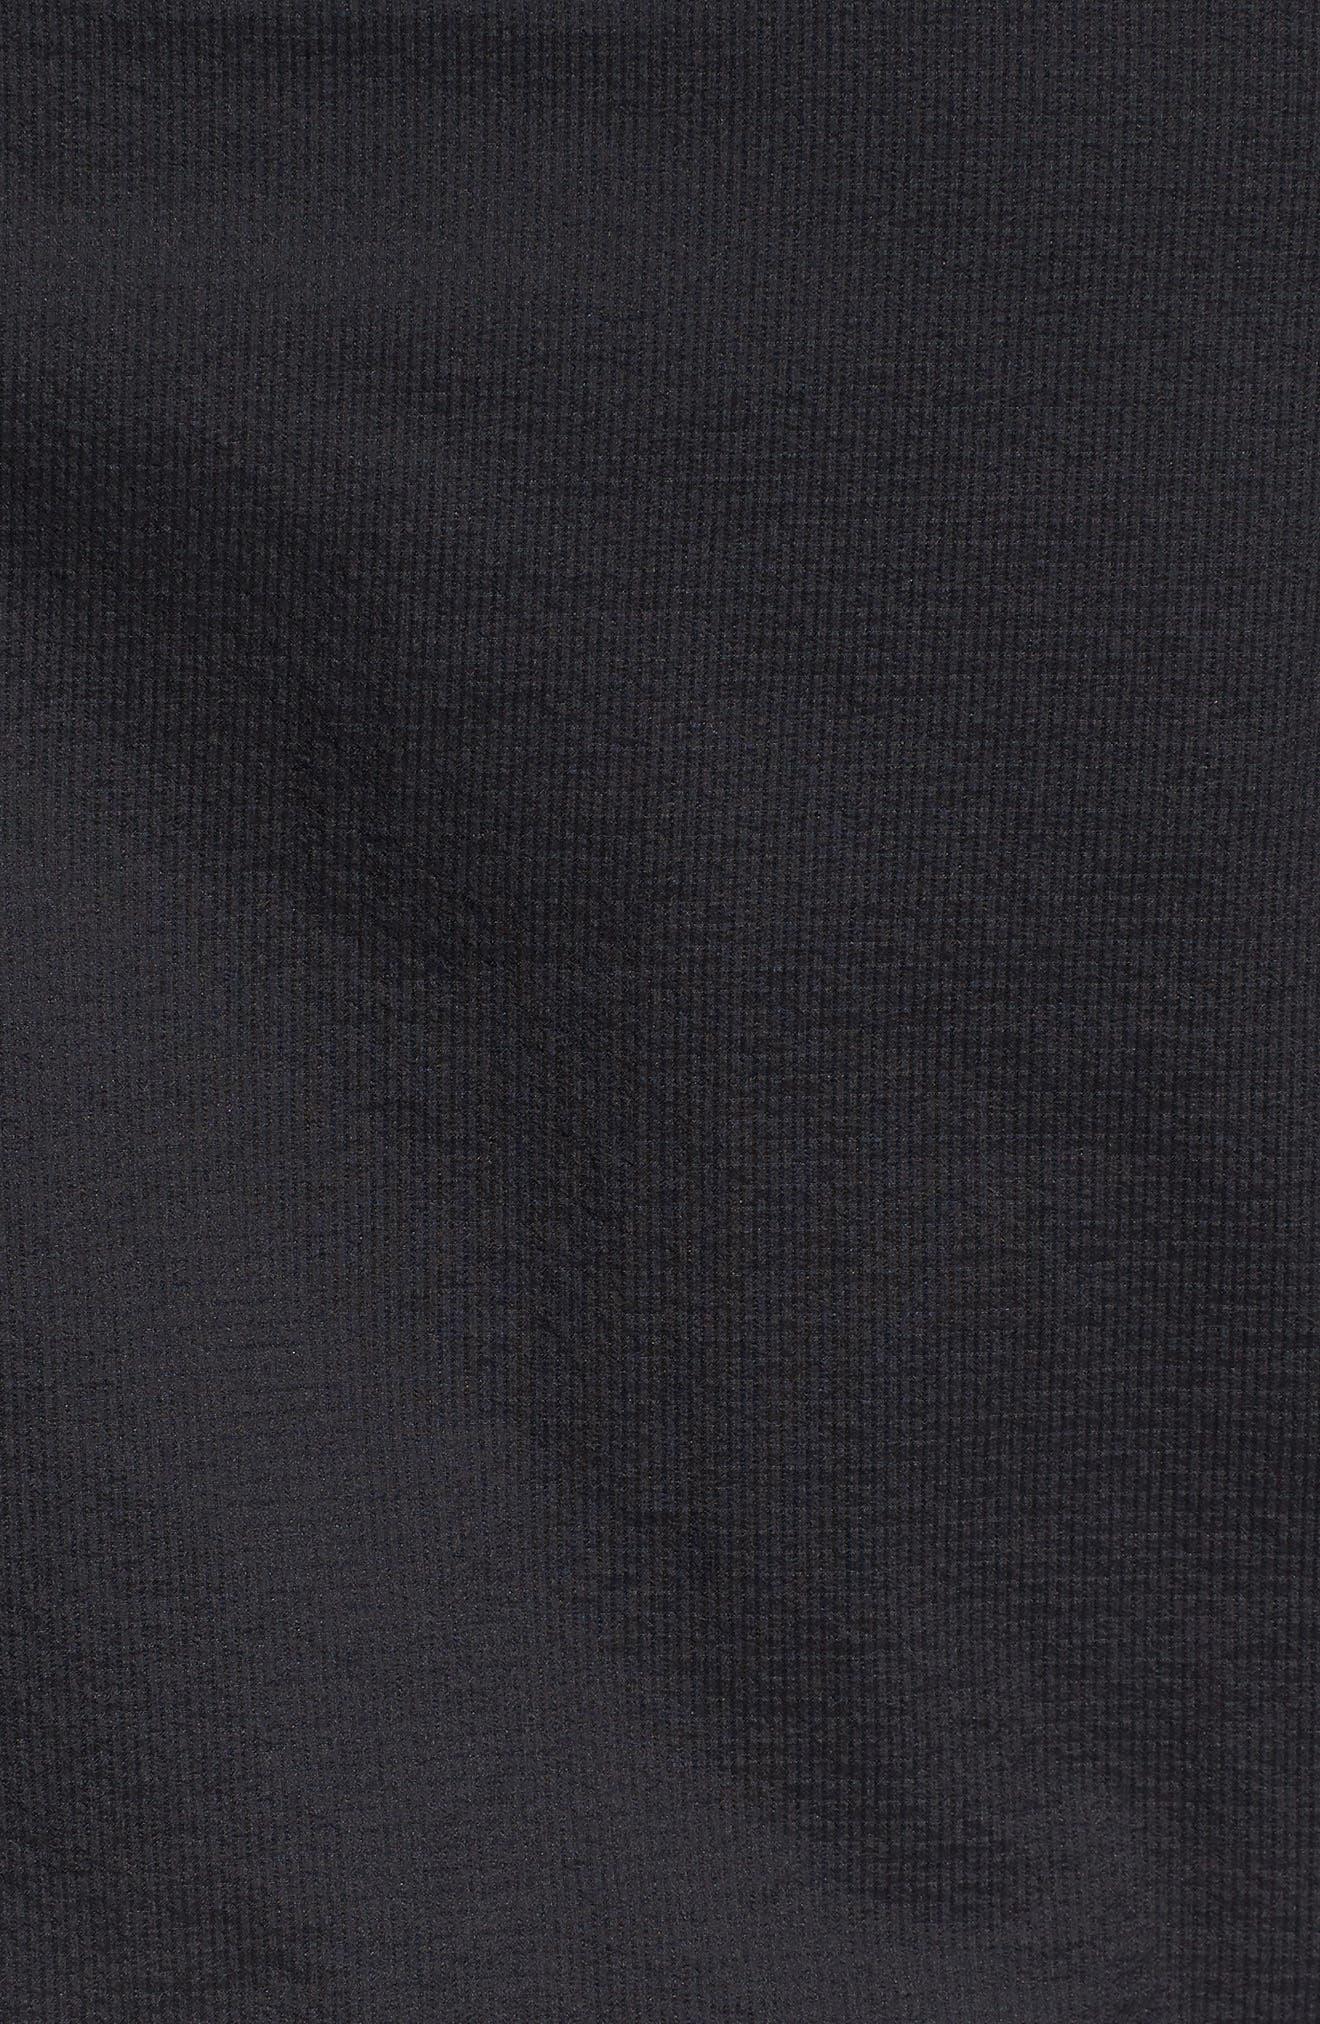 Run Division Jacket,                             Alternate thumbnail 5, color,                             Black